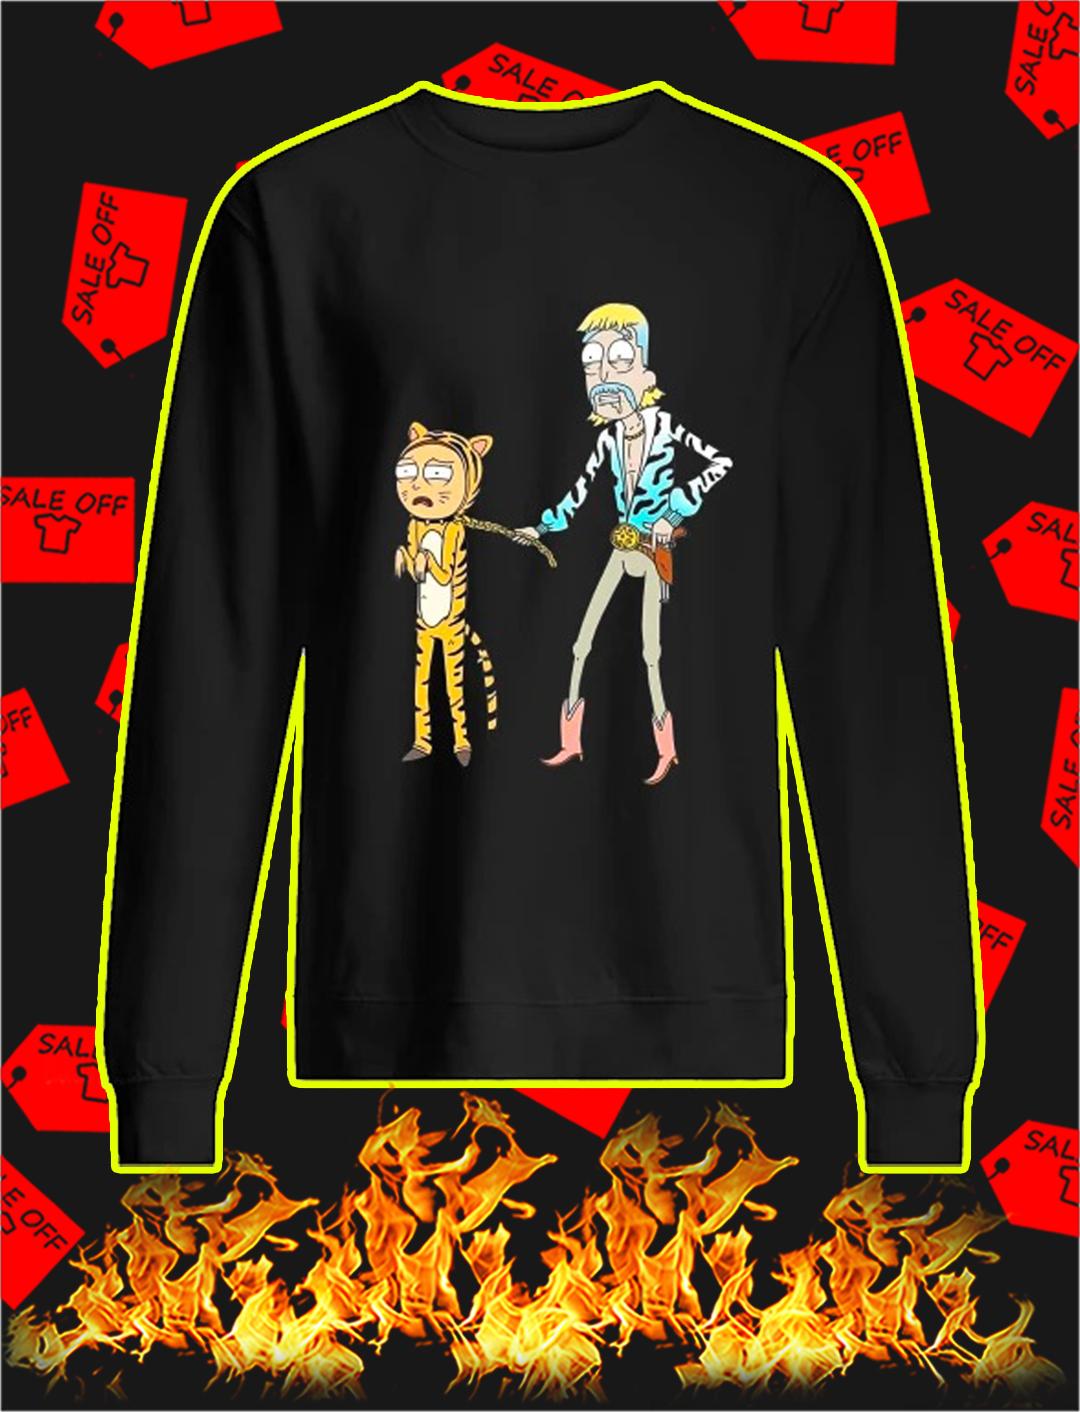 Tiger King Rick and Morty sweatshirt